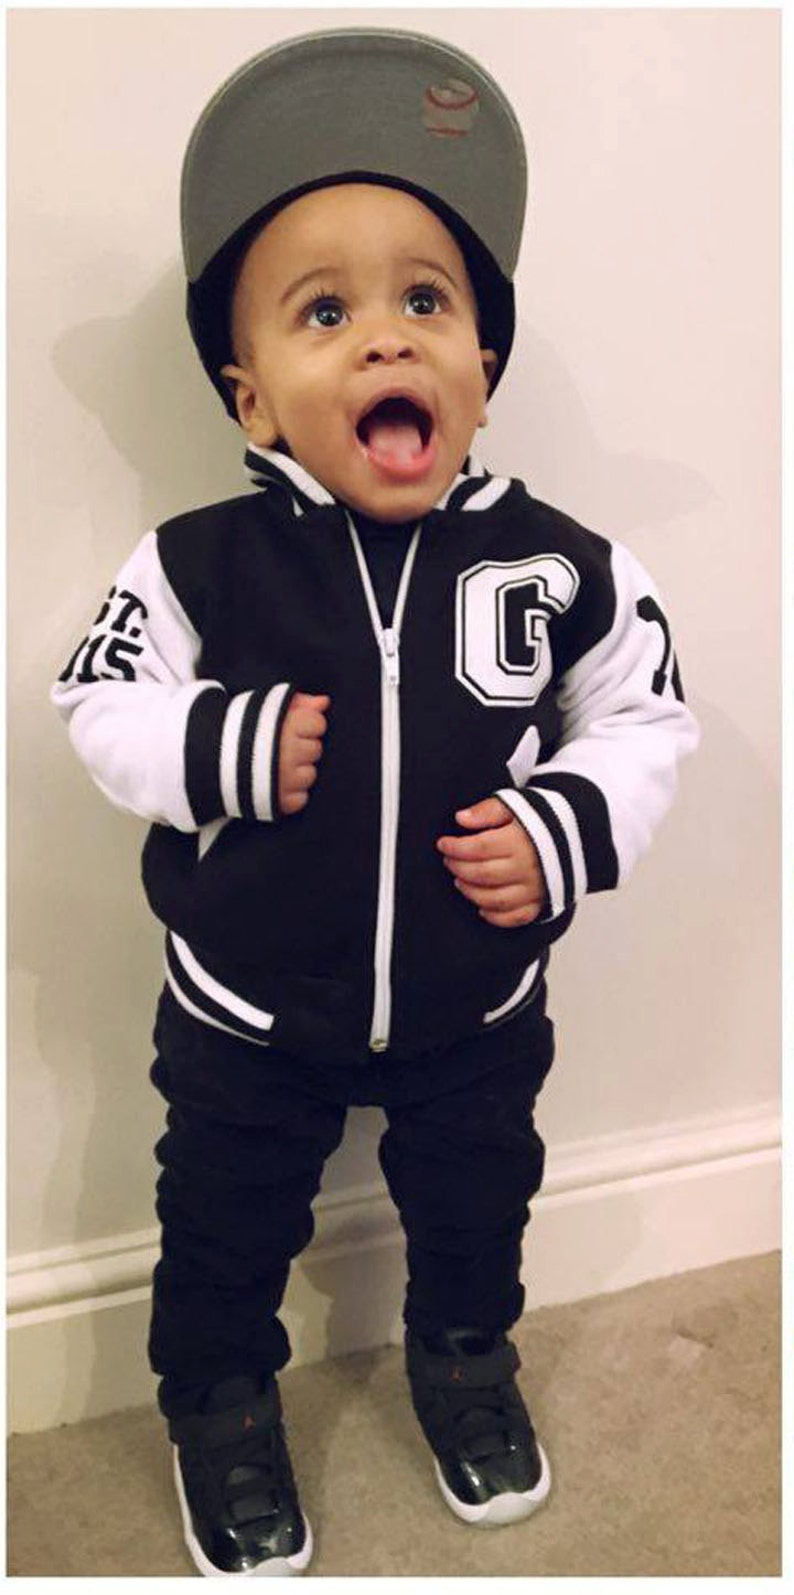 4ab02a1822d Infant Varsity Jacket Personalized Kids Varsity Jacket | Etsy